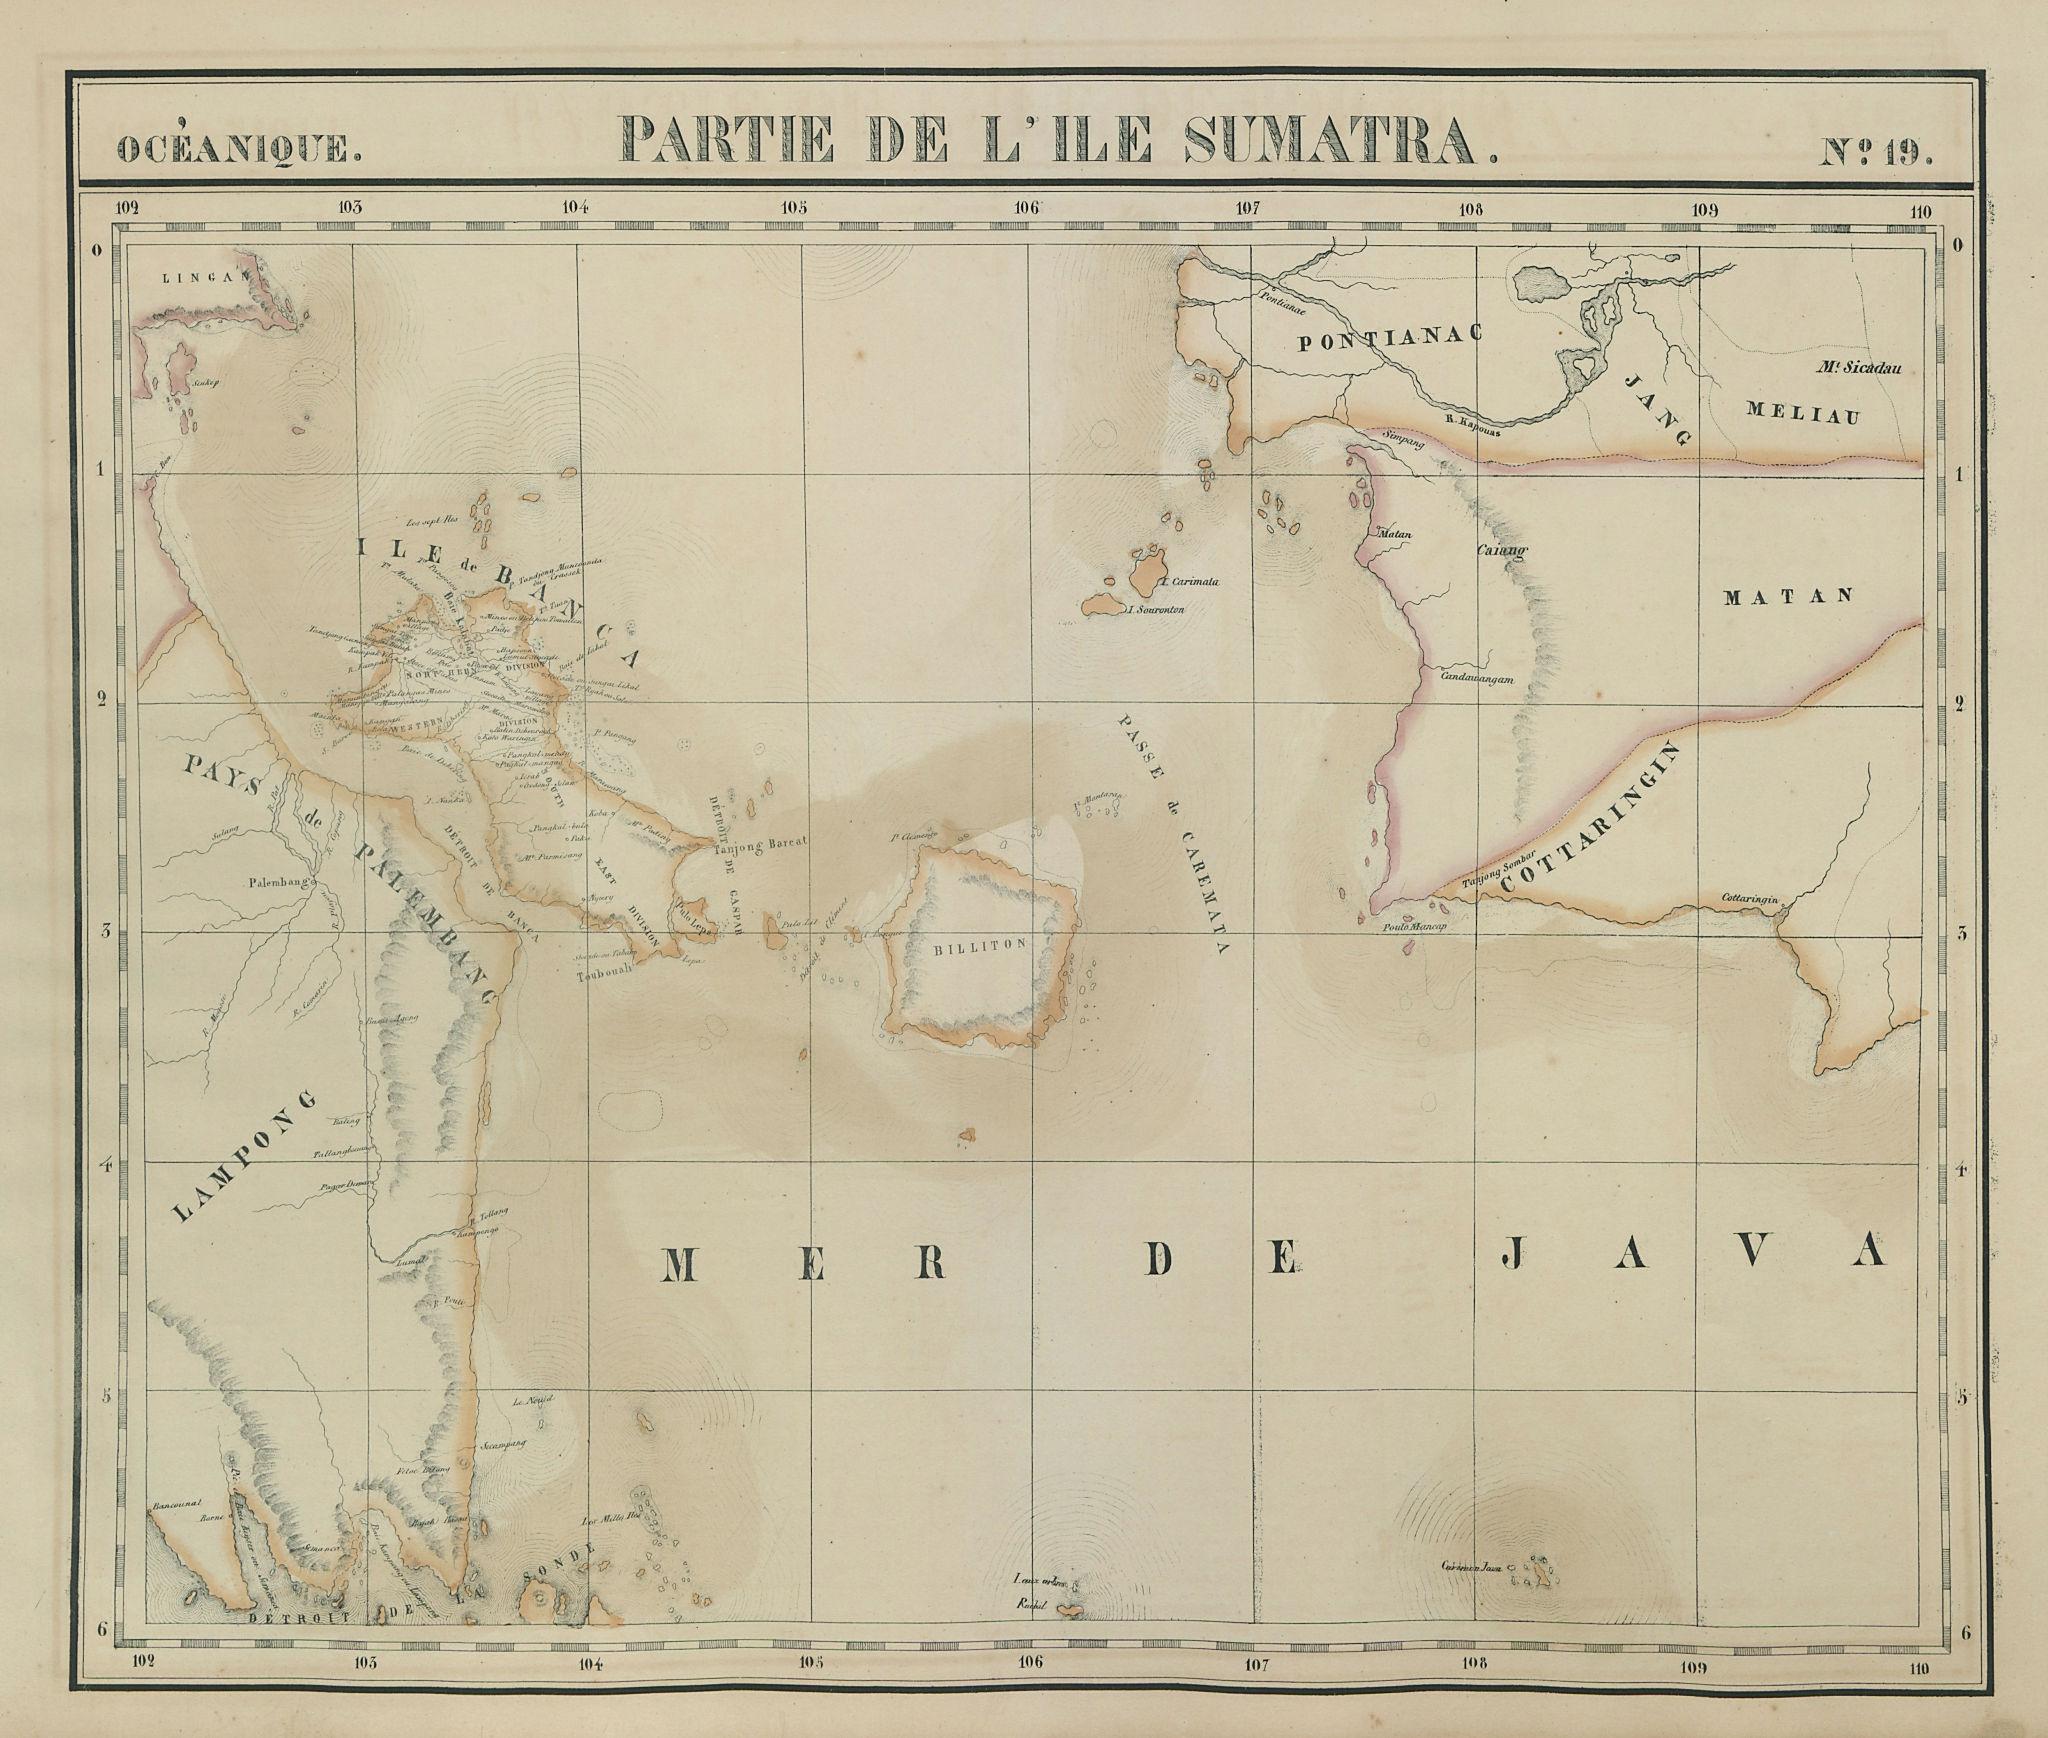 Océanique. Partie de l'ile Sumatra #19. Borneo Bangka. VANDERMAELEN 1827 map